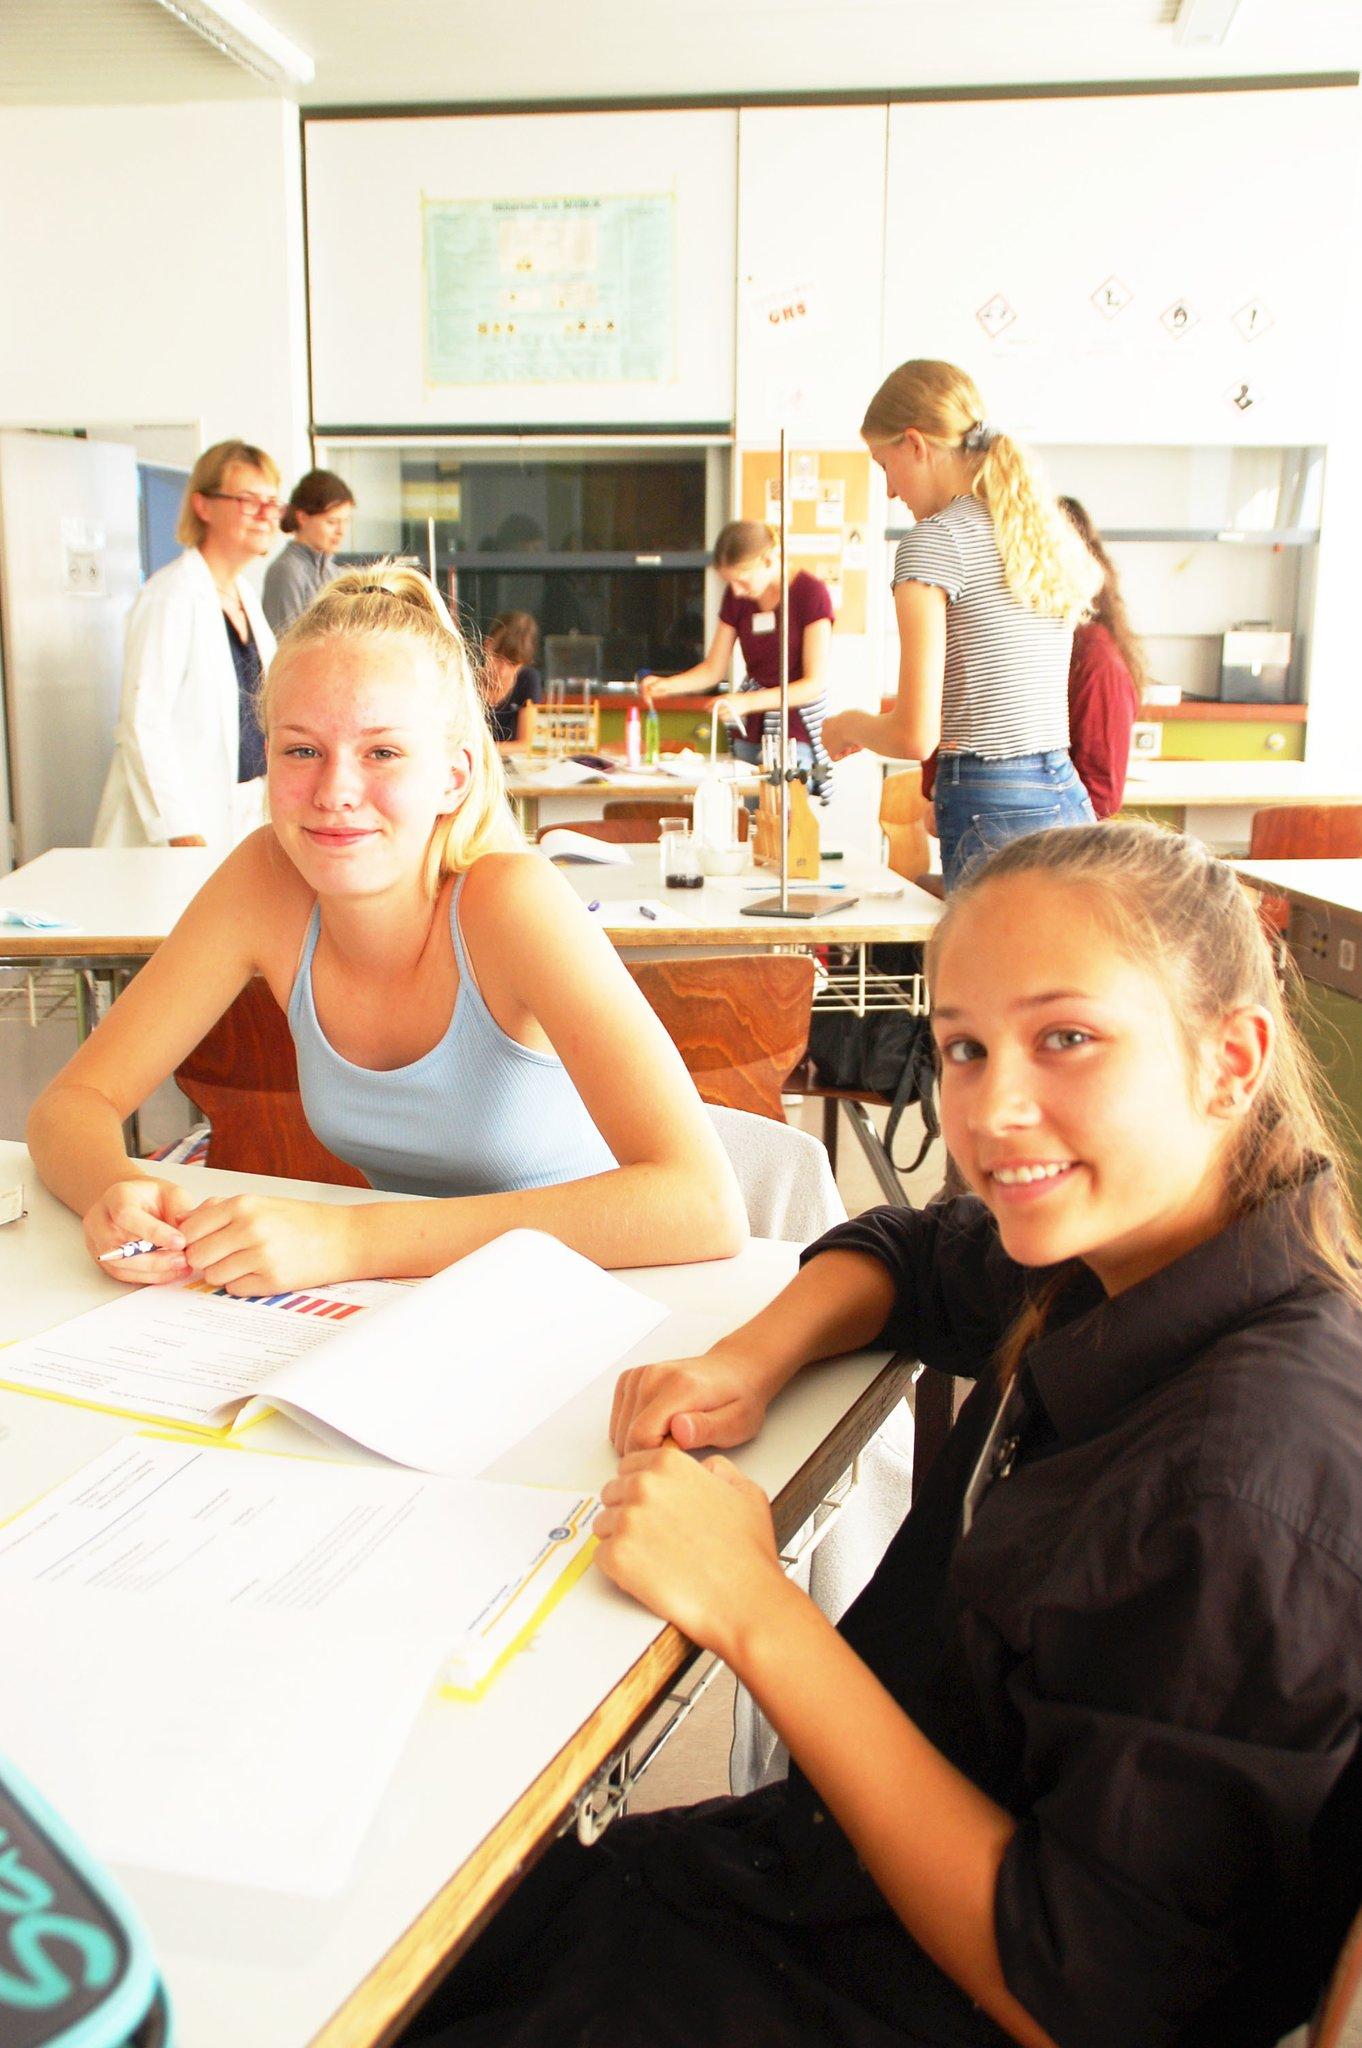 5 Mint Camp Fur Madchen In Buxtehude Schnupper Workshops Begeistern Fur Chemie Und Technik Madchen Mogen Mint Buxtehude